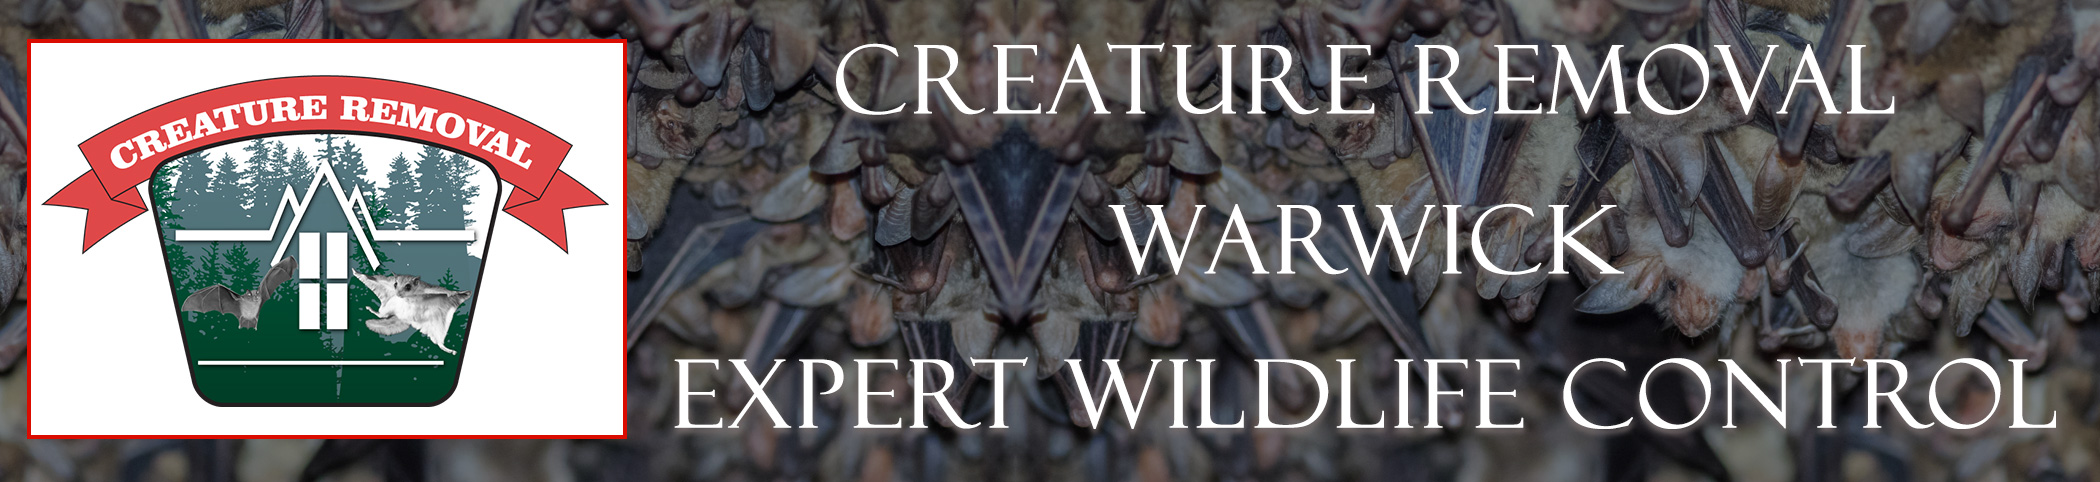 warwick-rhode-island-creature-removal-header